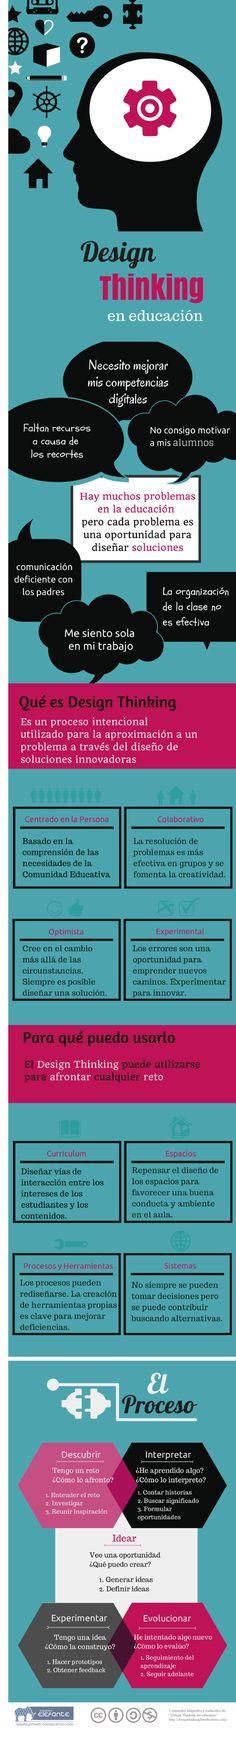 Design Thinking para la educación #infografia #infographic #education